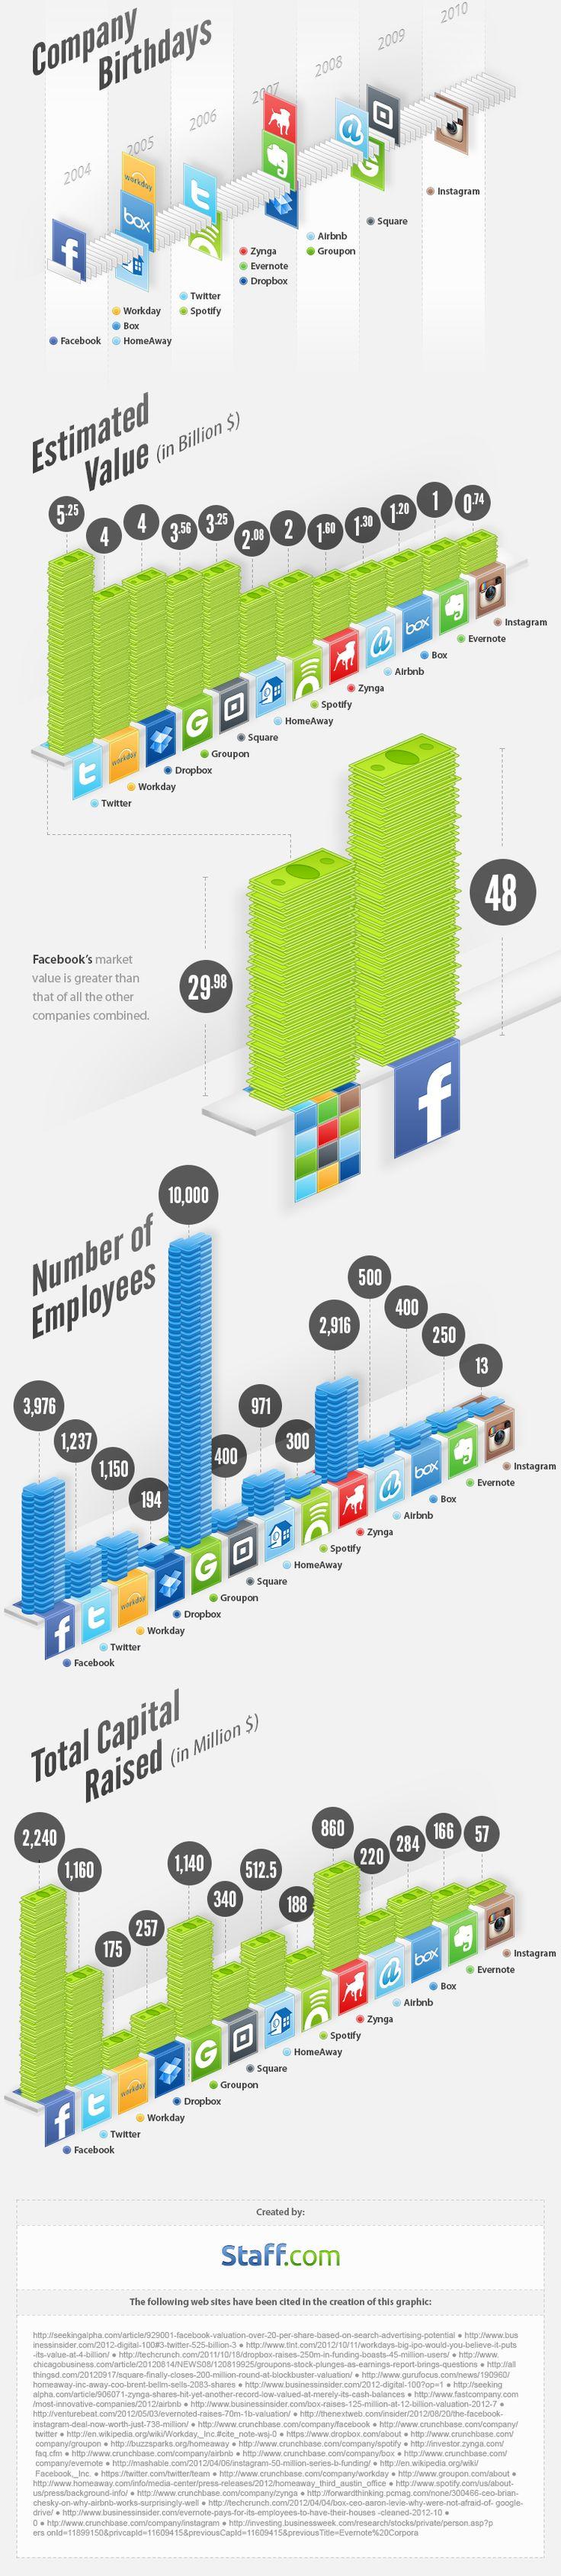 The billion dollar startups